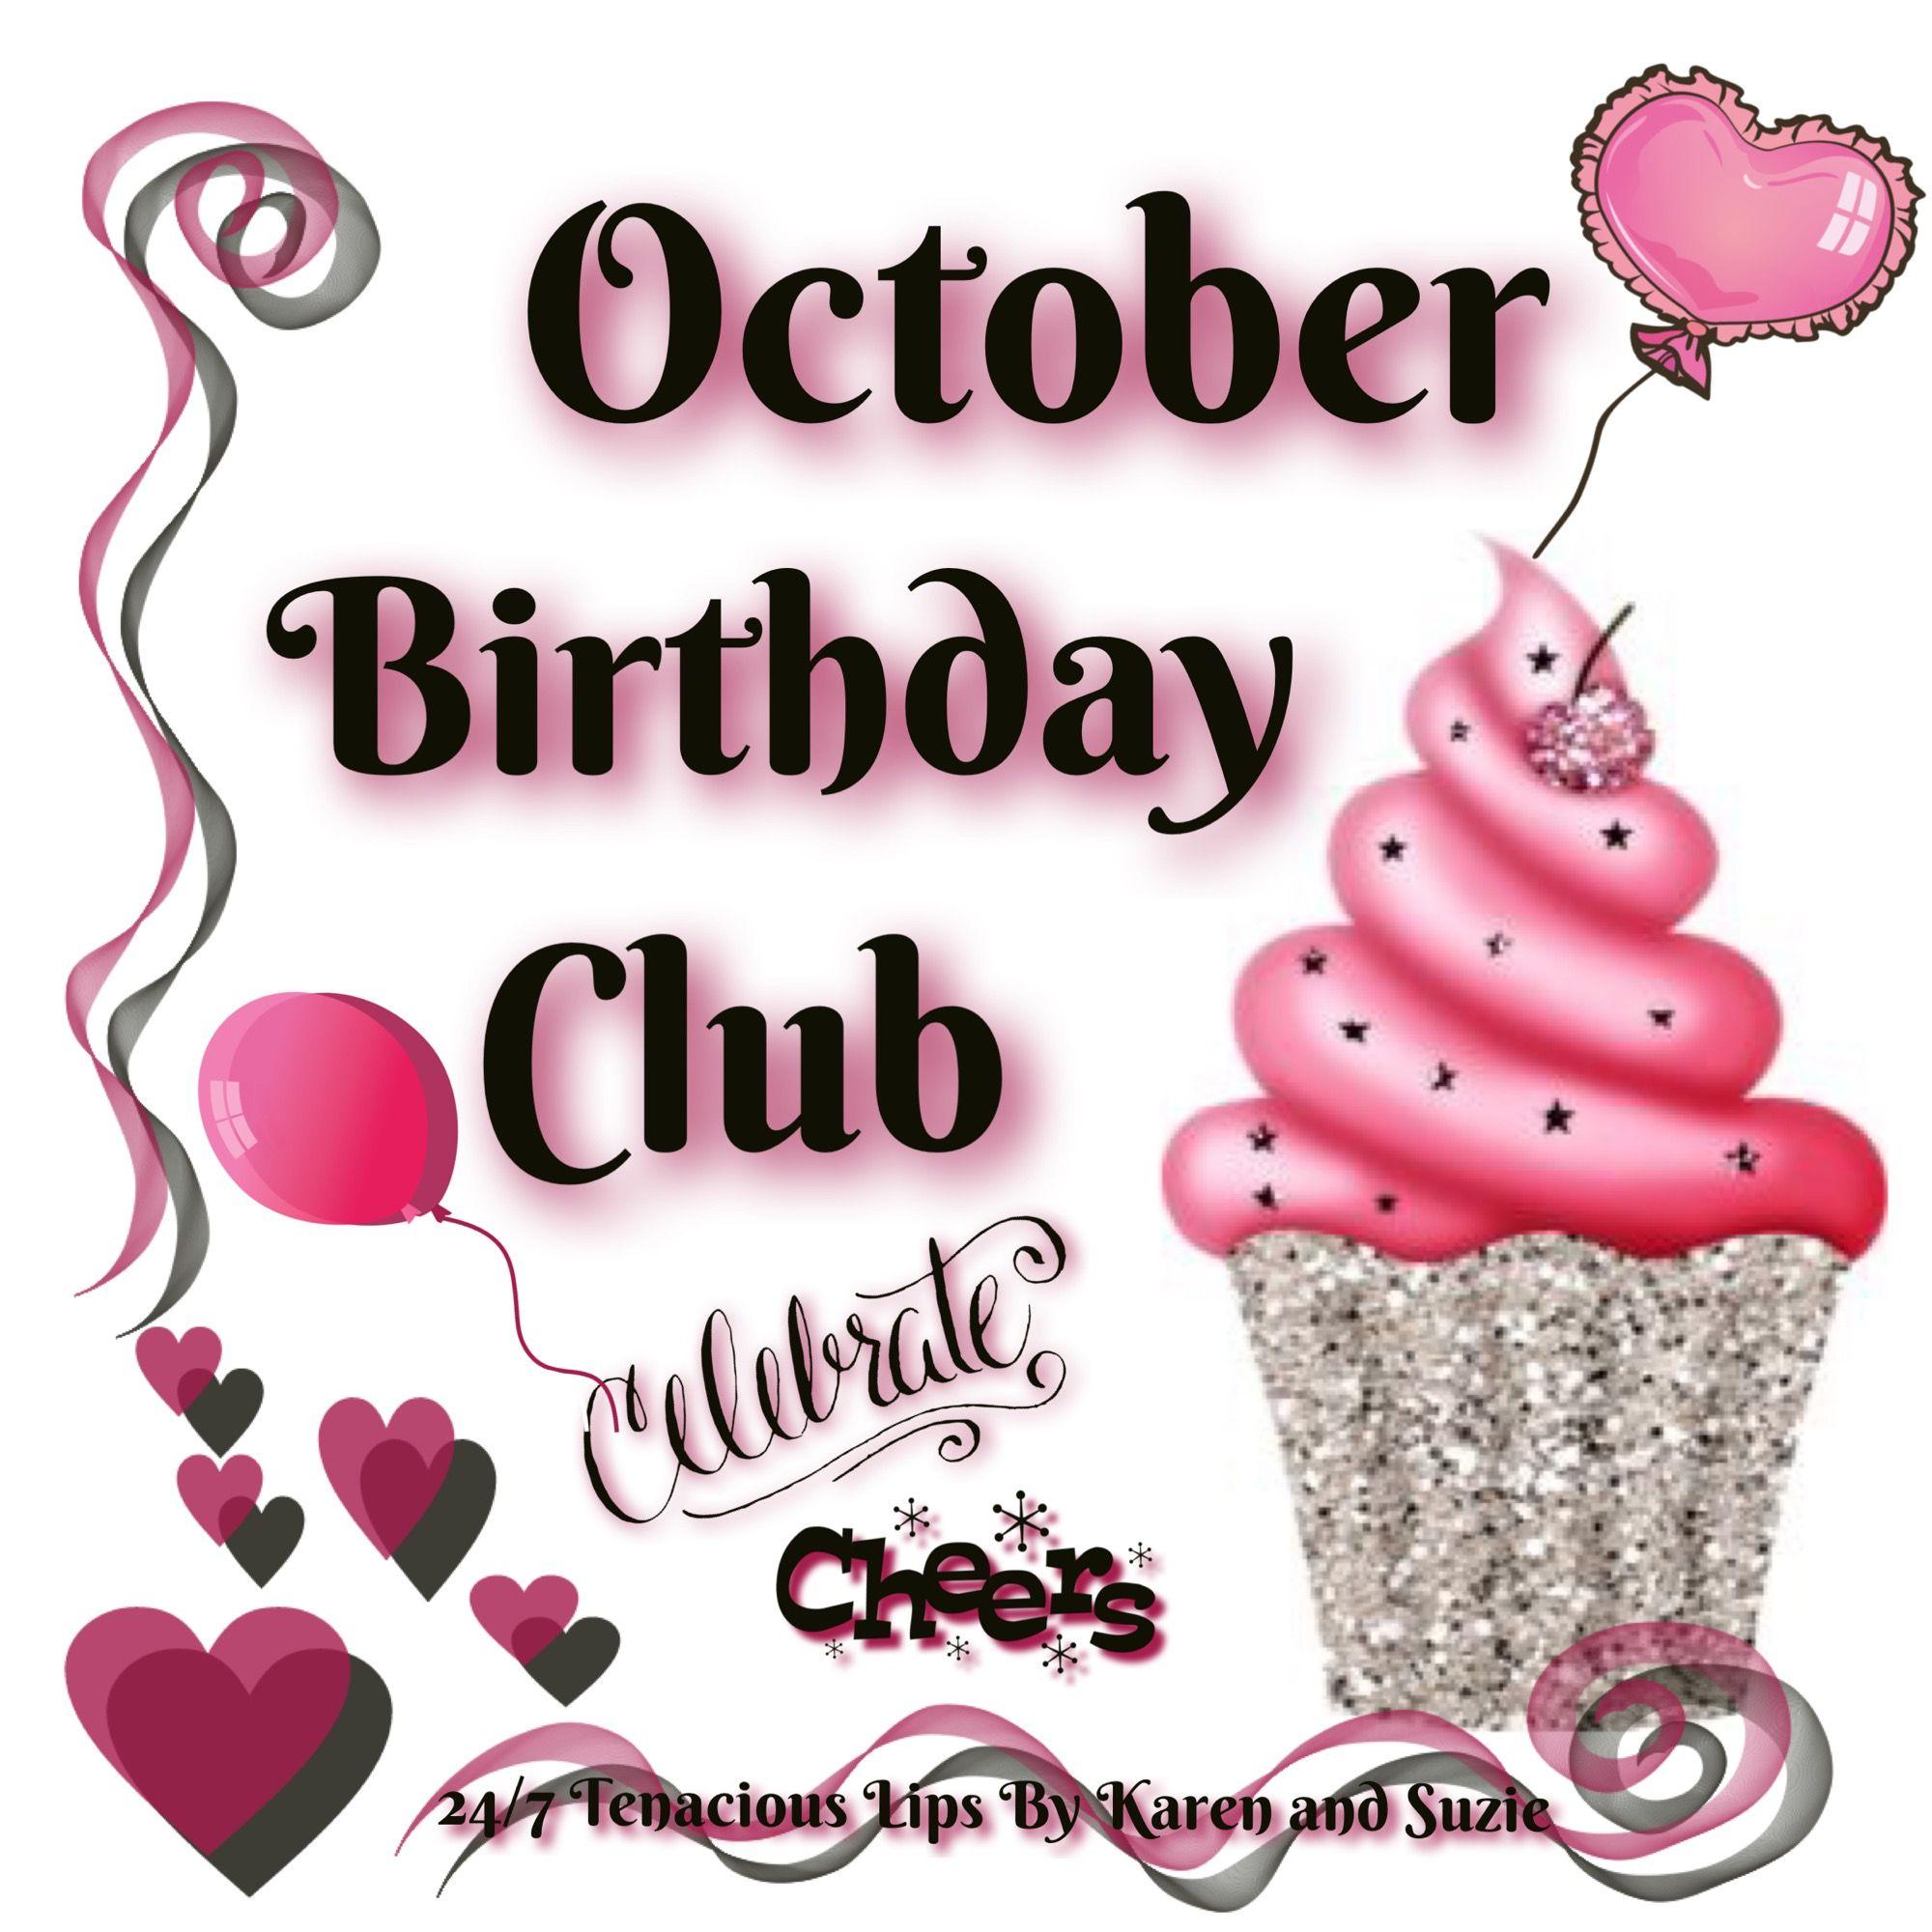 Lipsense Birthday Or The Month Club Distributor Id 250632 247